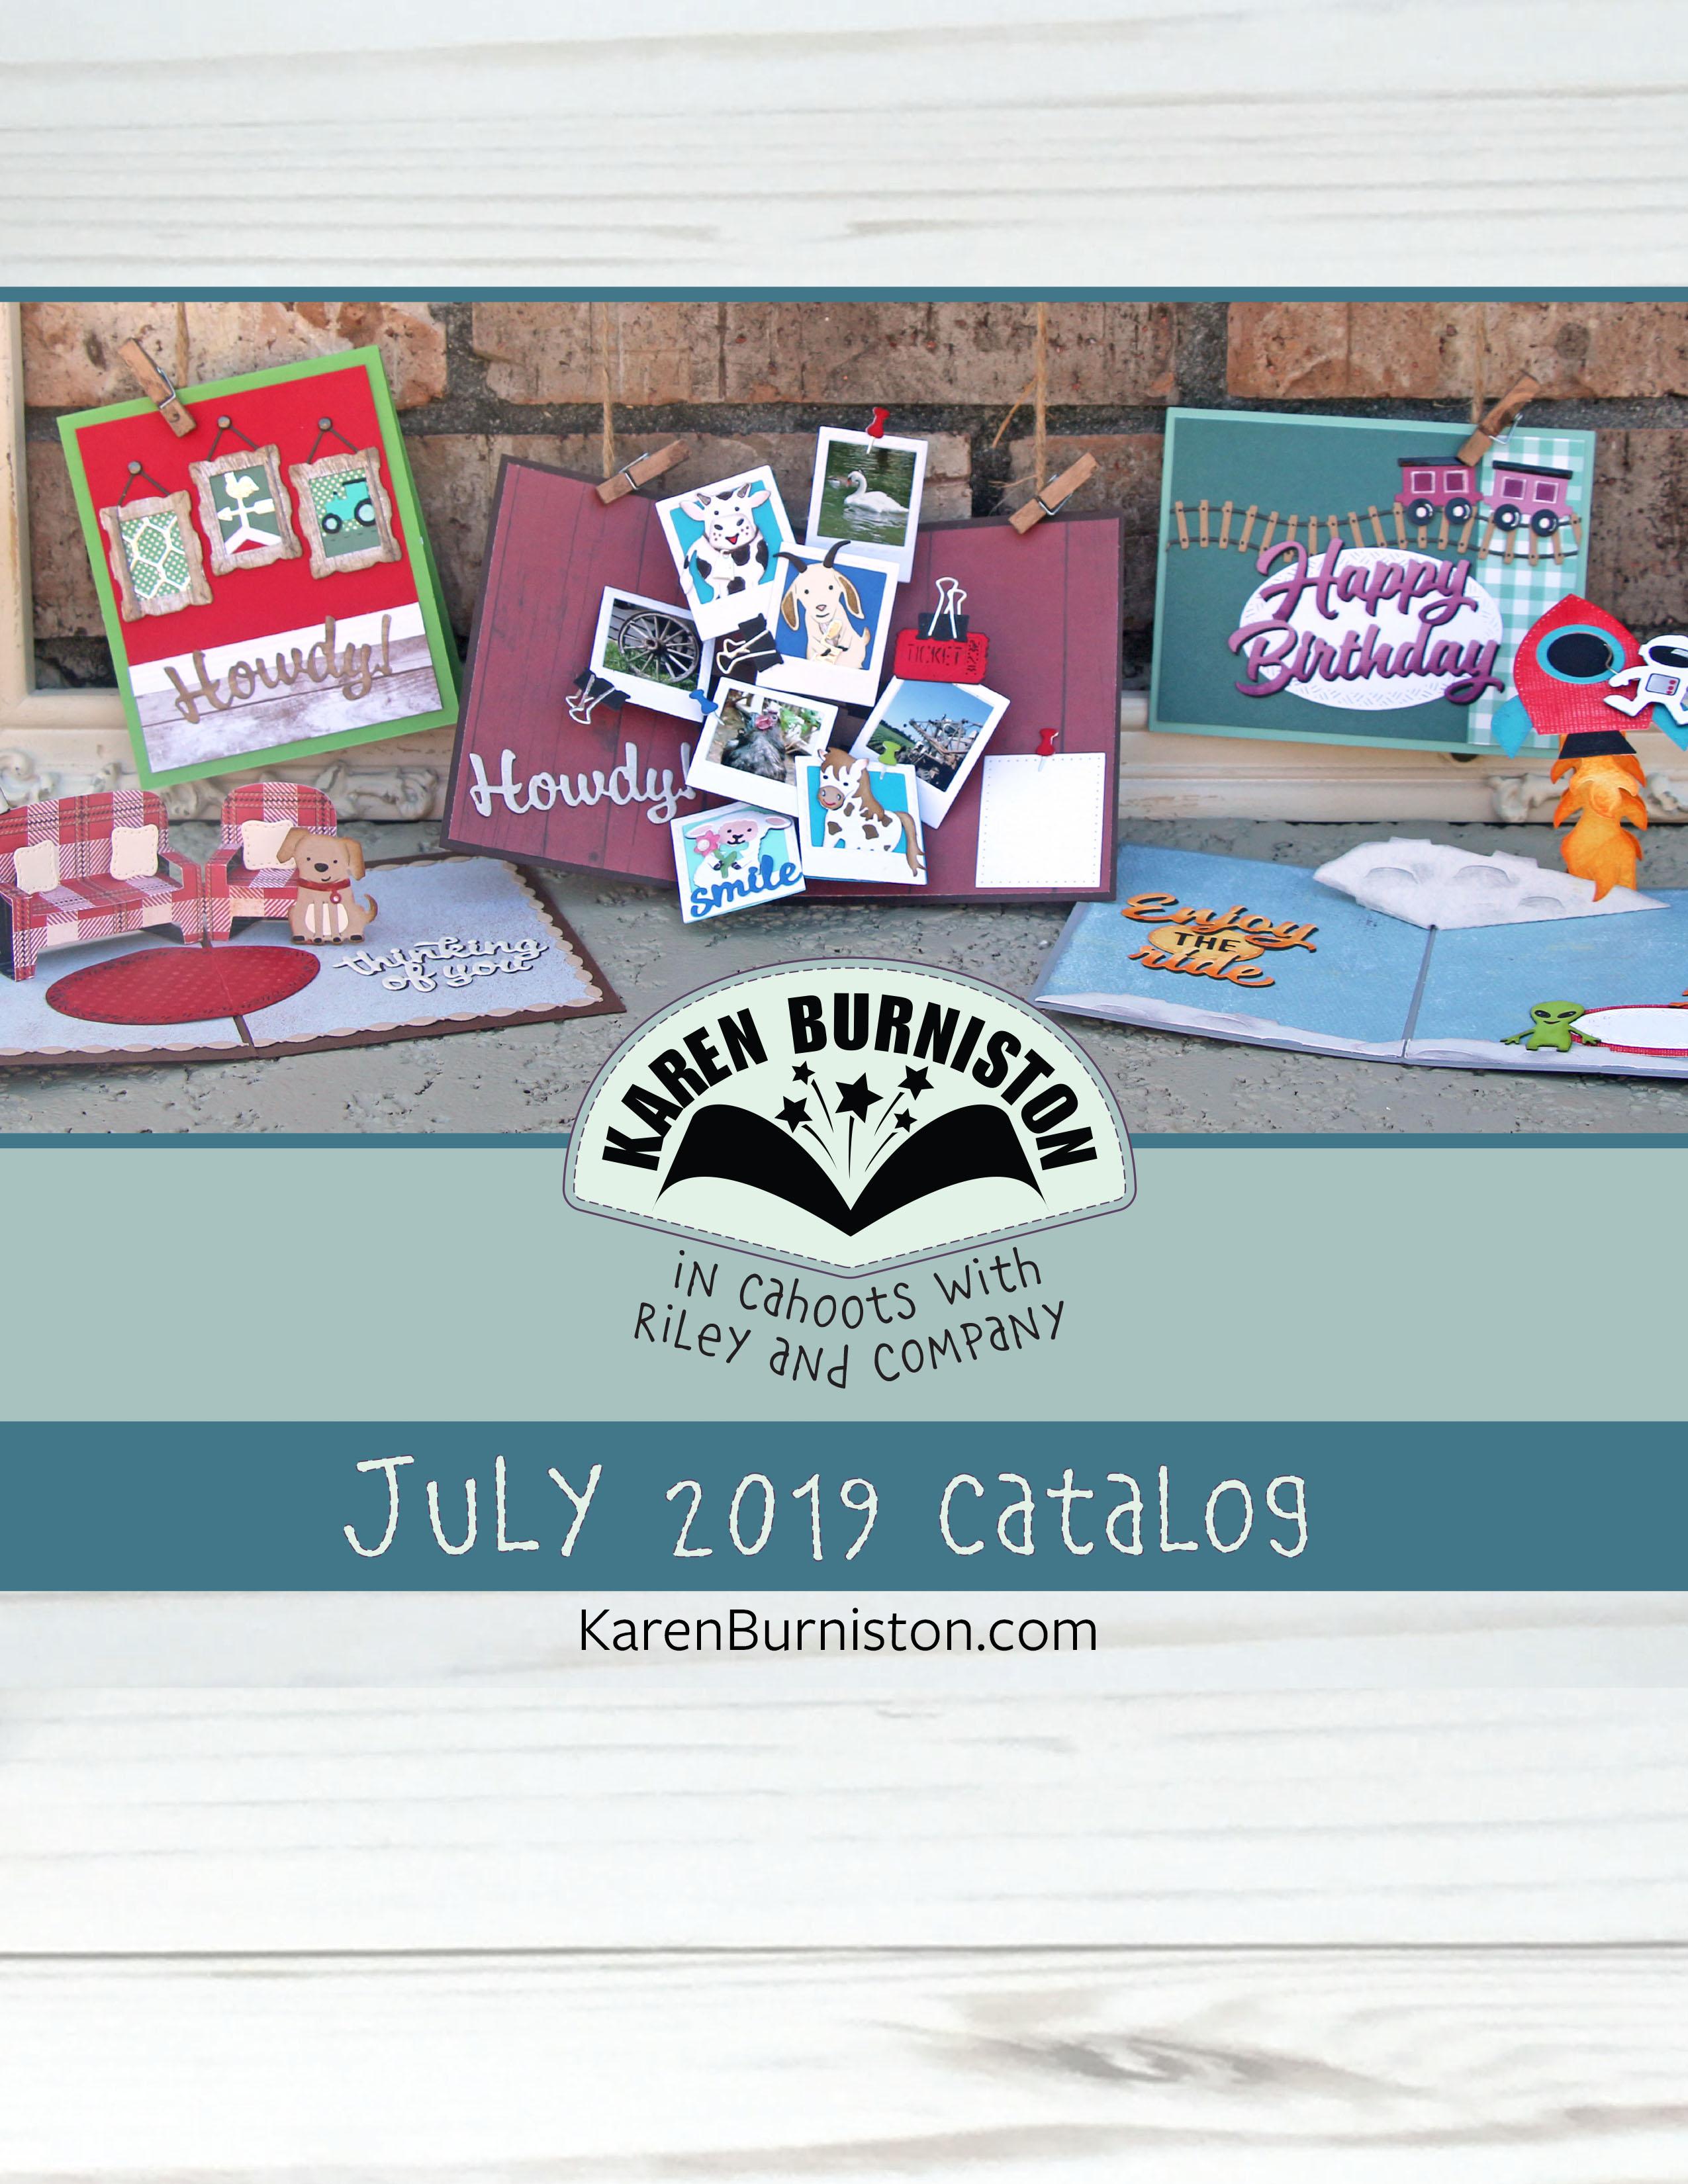 kb-riley-july-2019-catalog-cover-2-.jpg